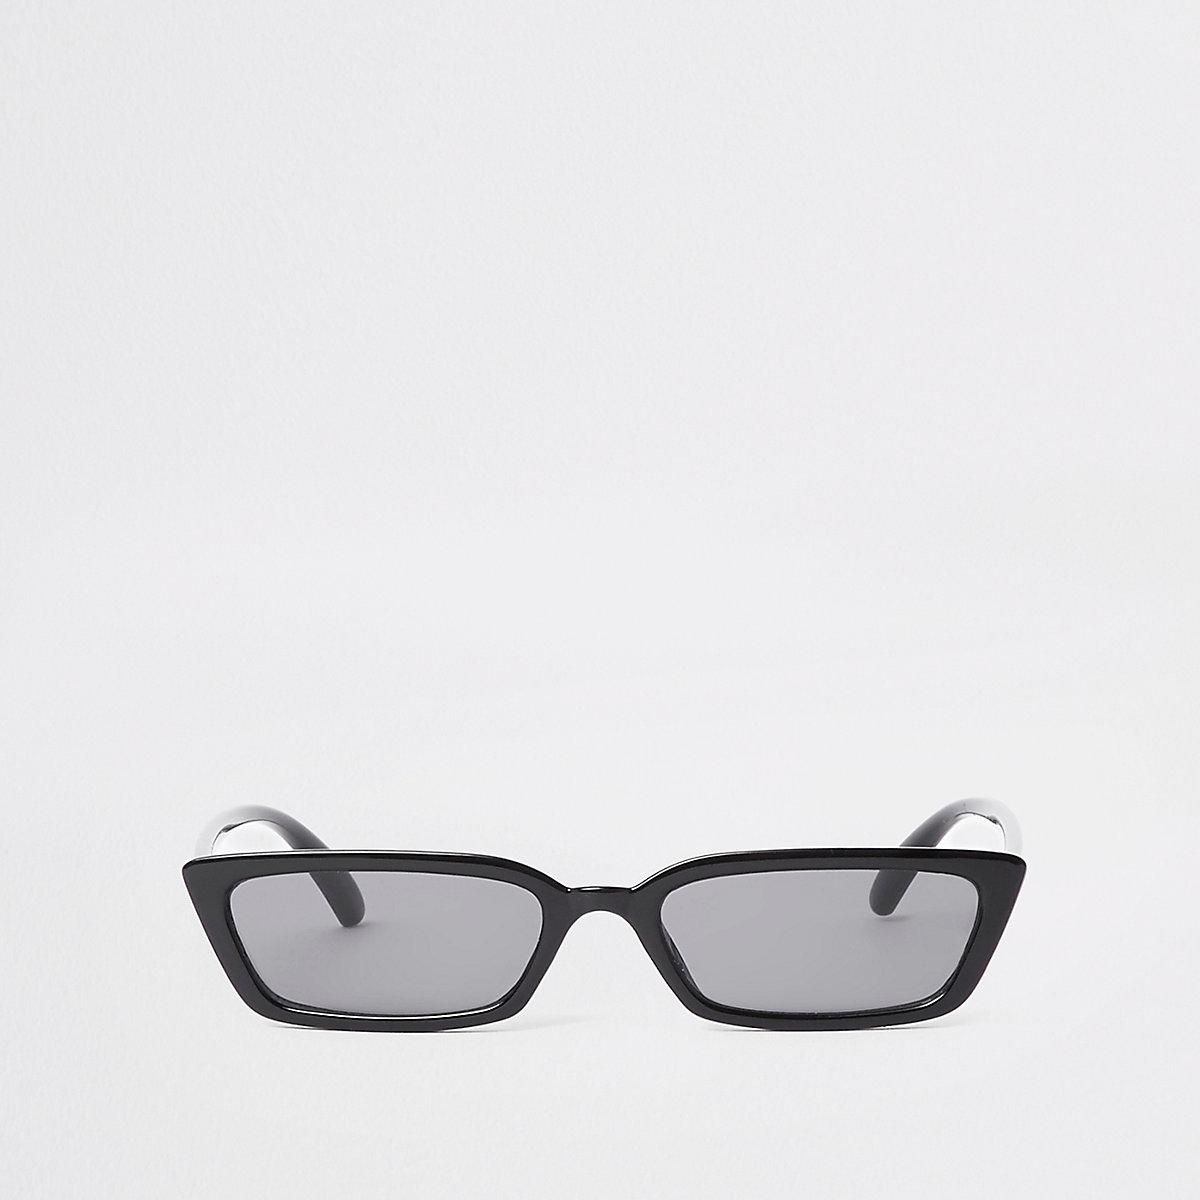 Black slim frame smoke lens sunglasses